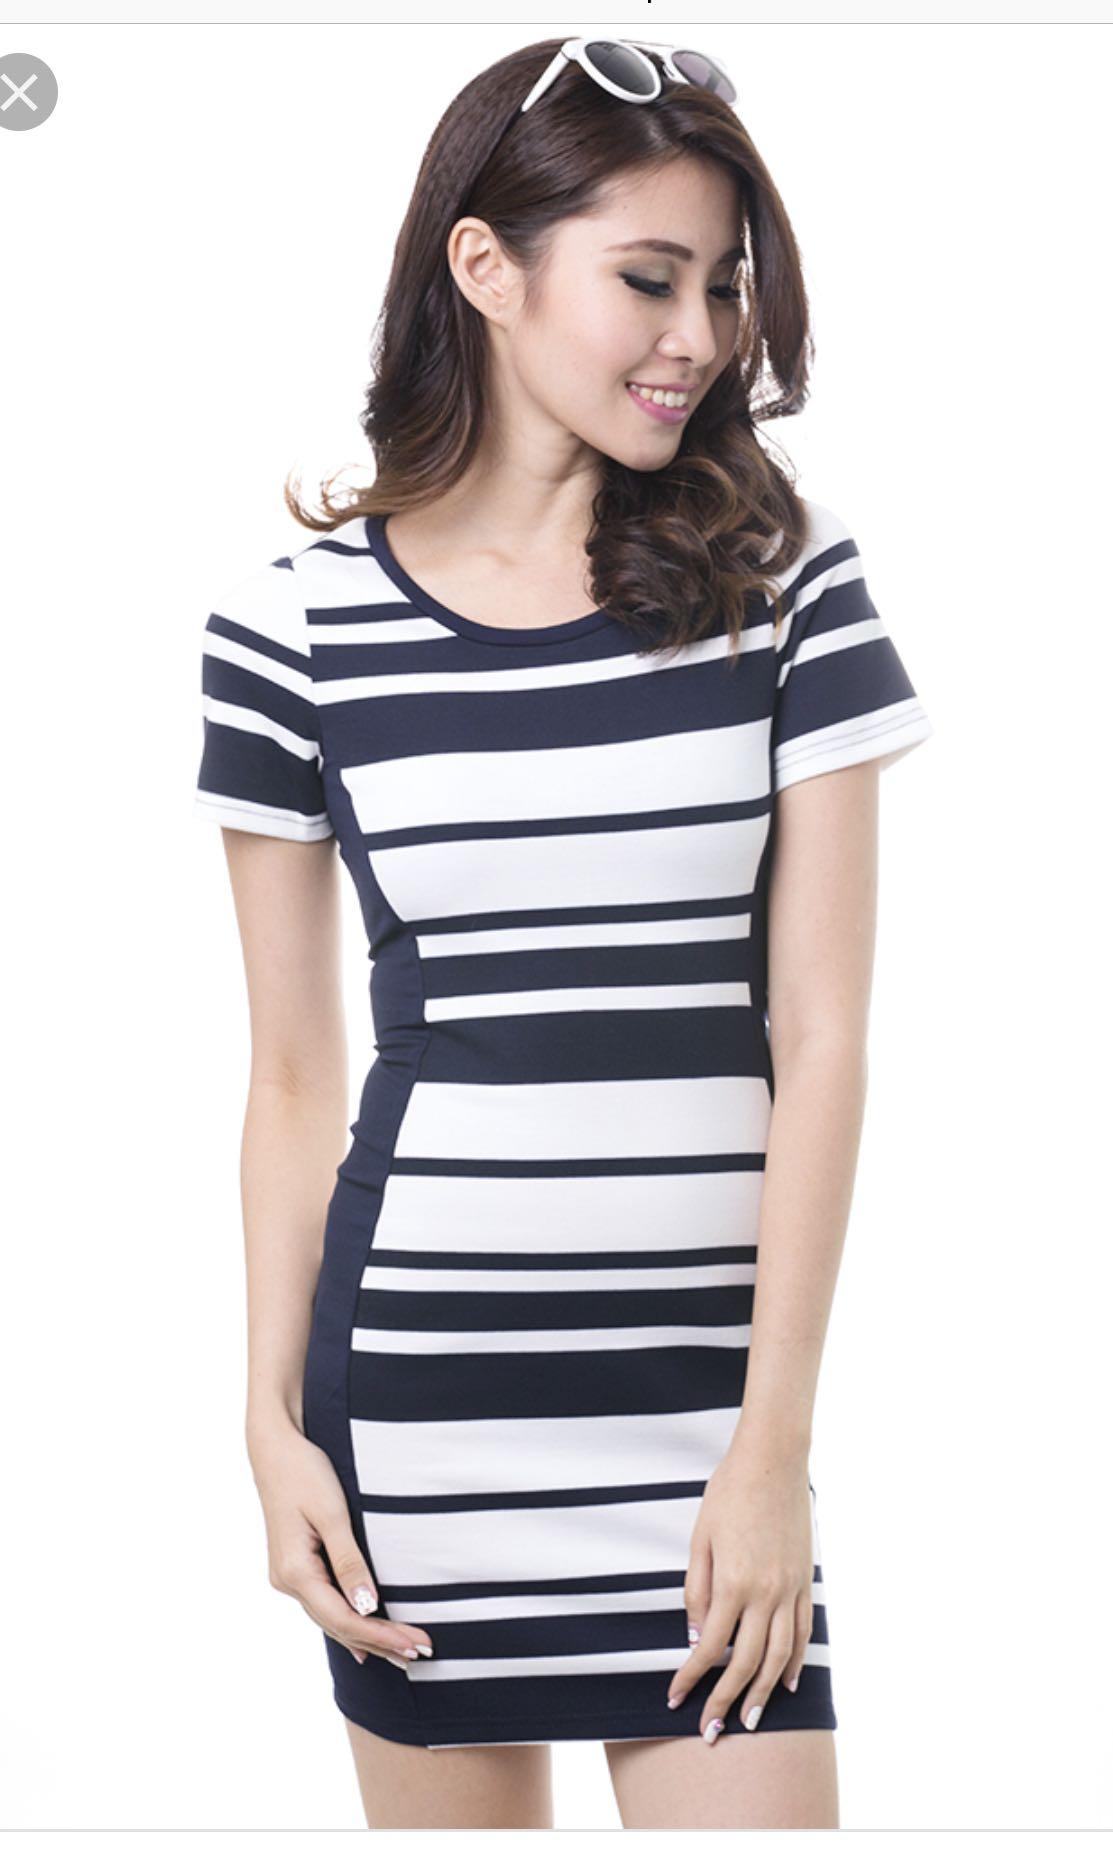 53ae601cc MDS stripes bodicon dress, Women's Fashion, Clothes, Dresses ...